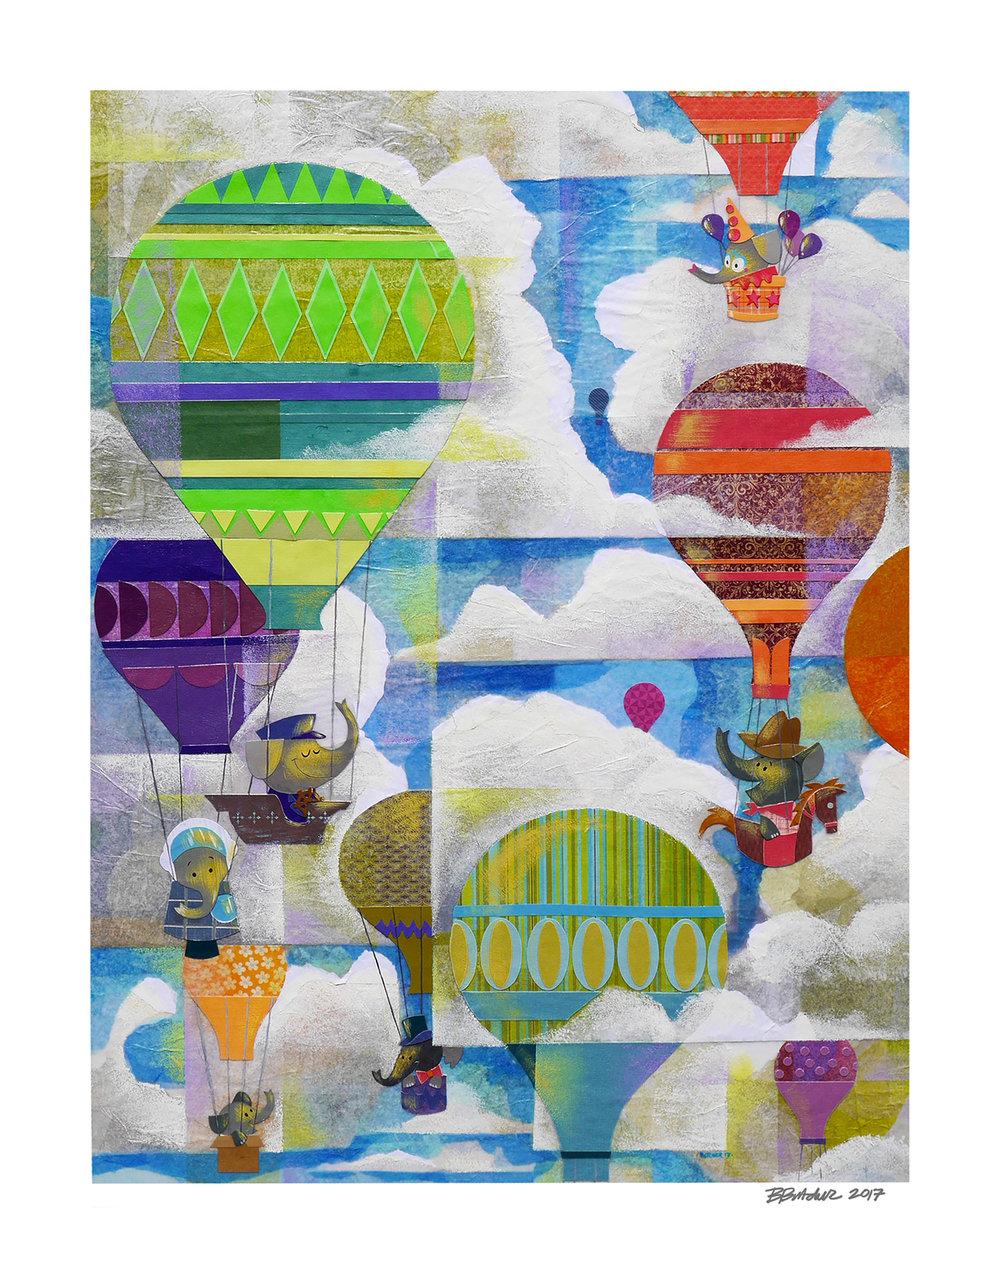 'High Hope' by Ben Butcher